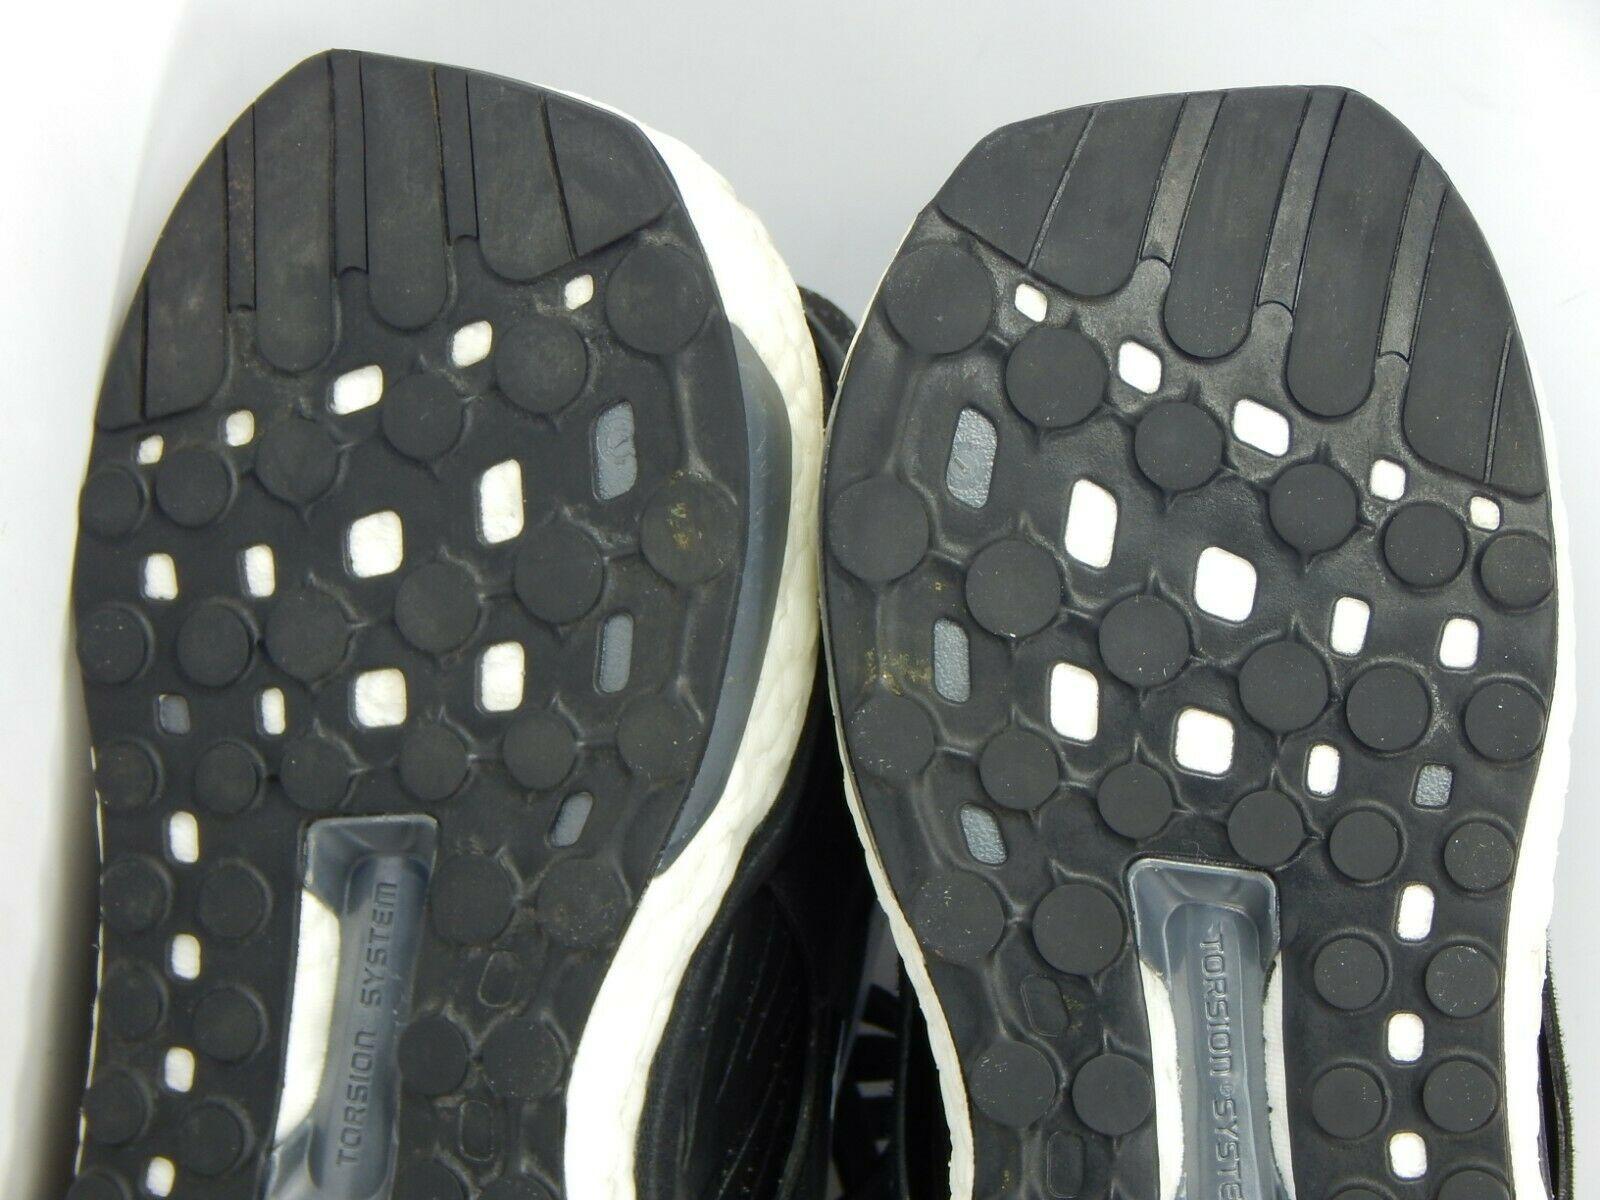 Adidas Energy Boost Misura USA 9.5 M (D) Eu 43 1/3 Uomo Scarpe da Corsa Nero image 9